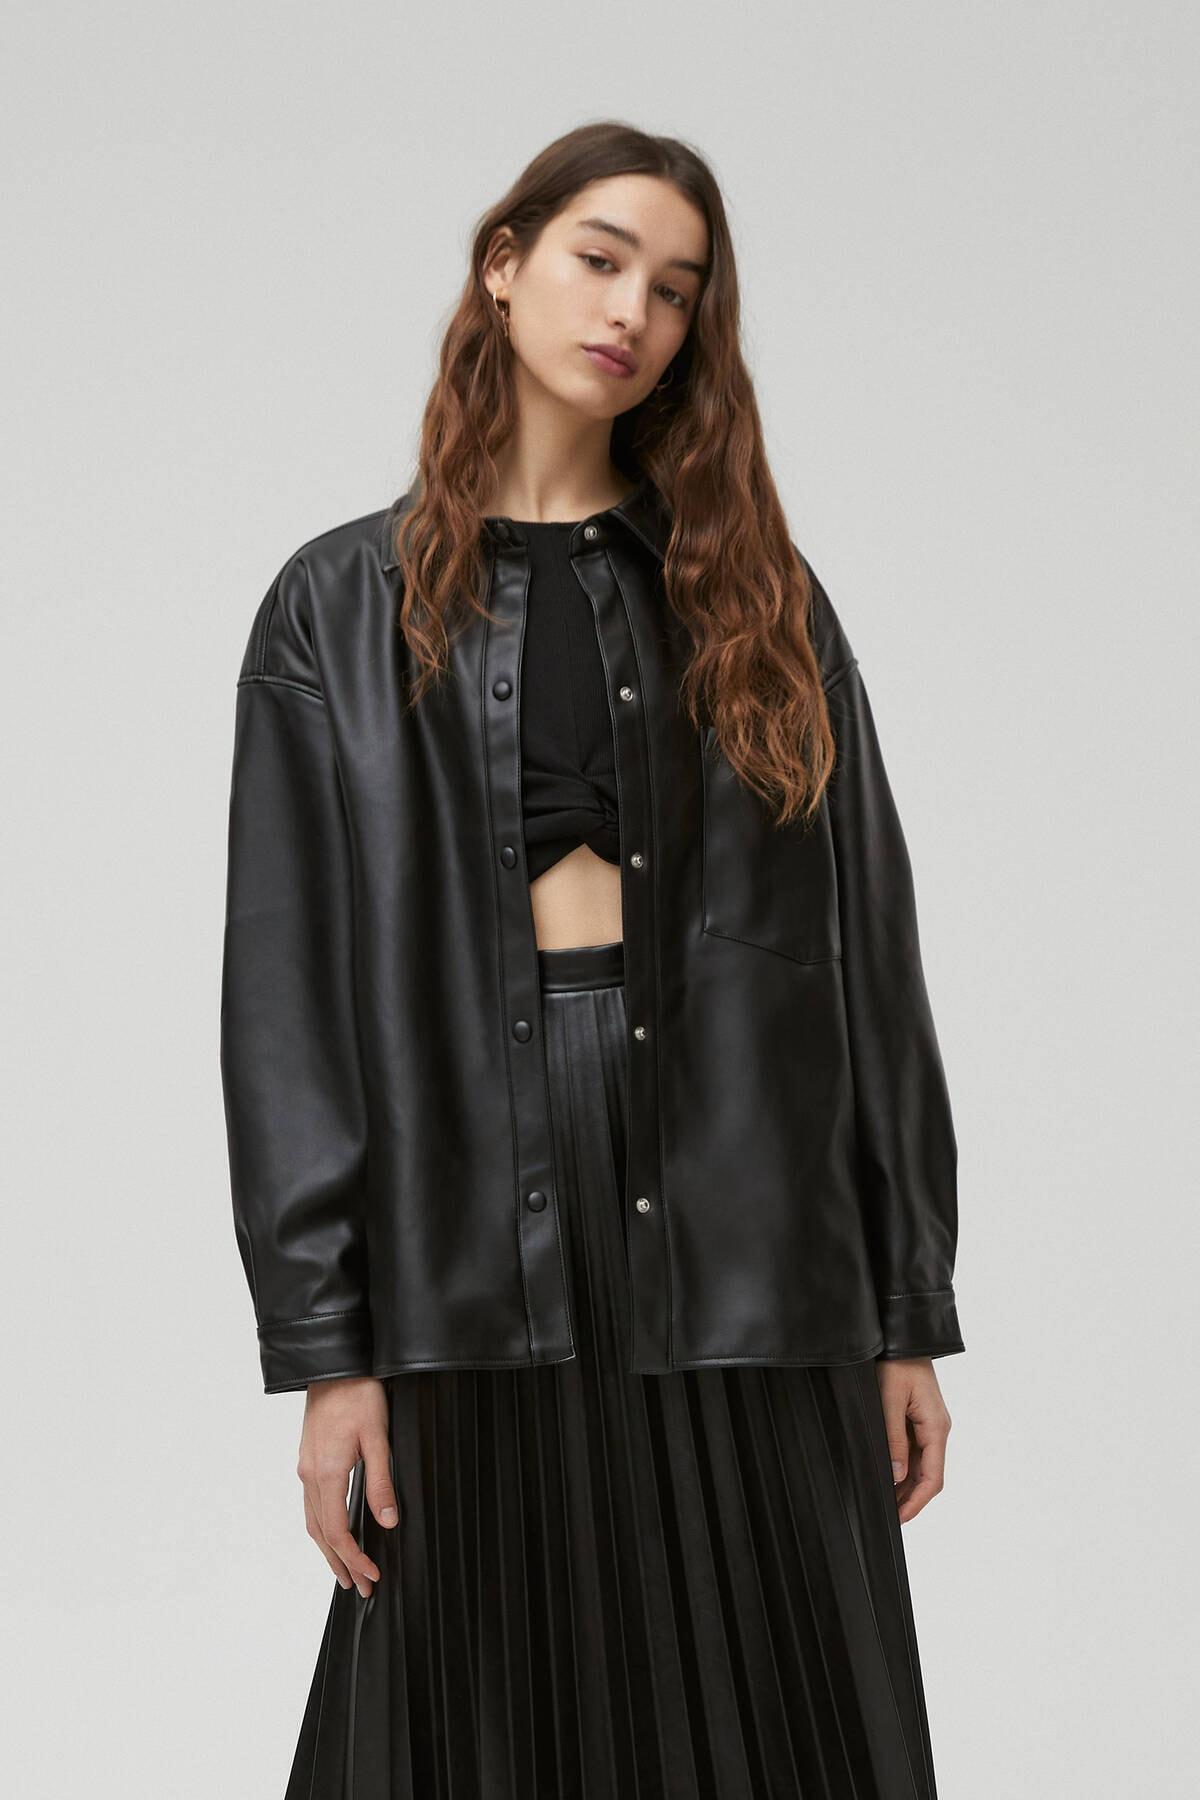 Pull & Bear Kadın Siyah Suni Deri Ince Ceket 1